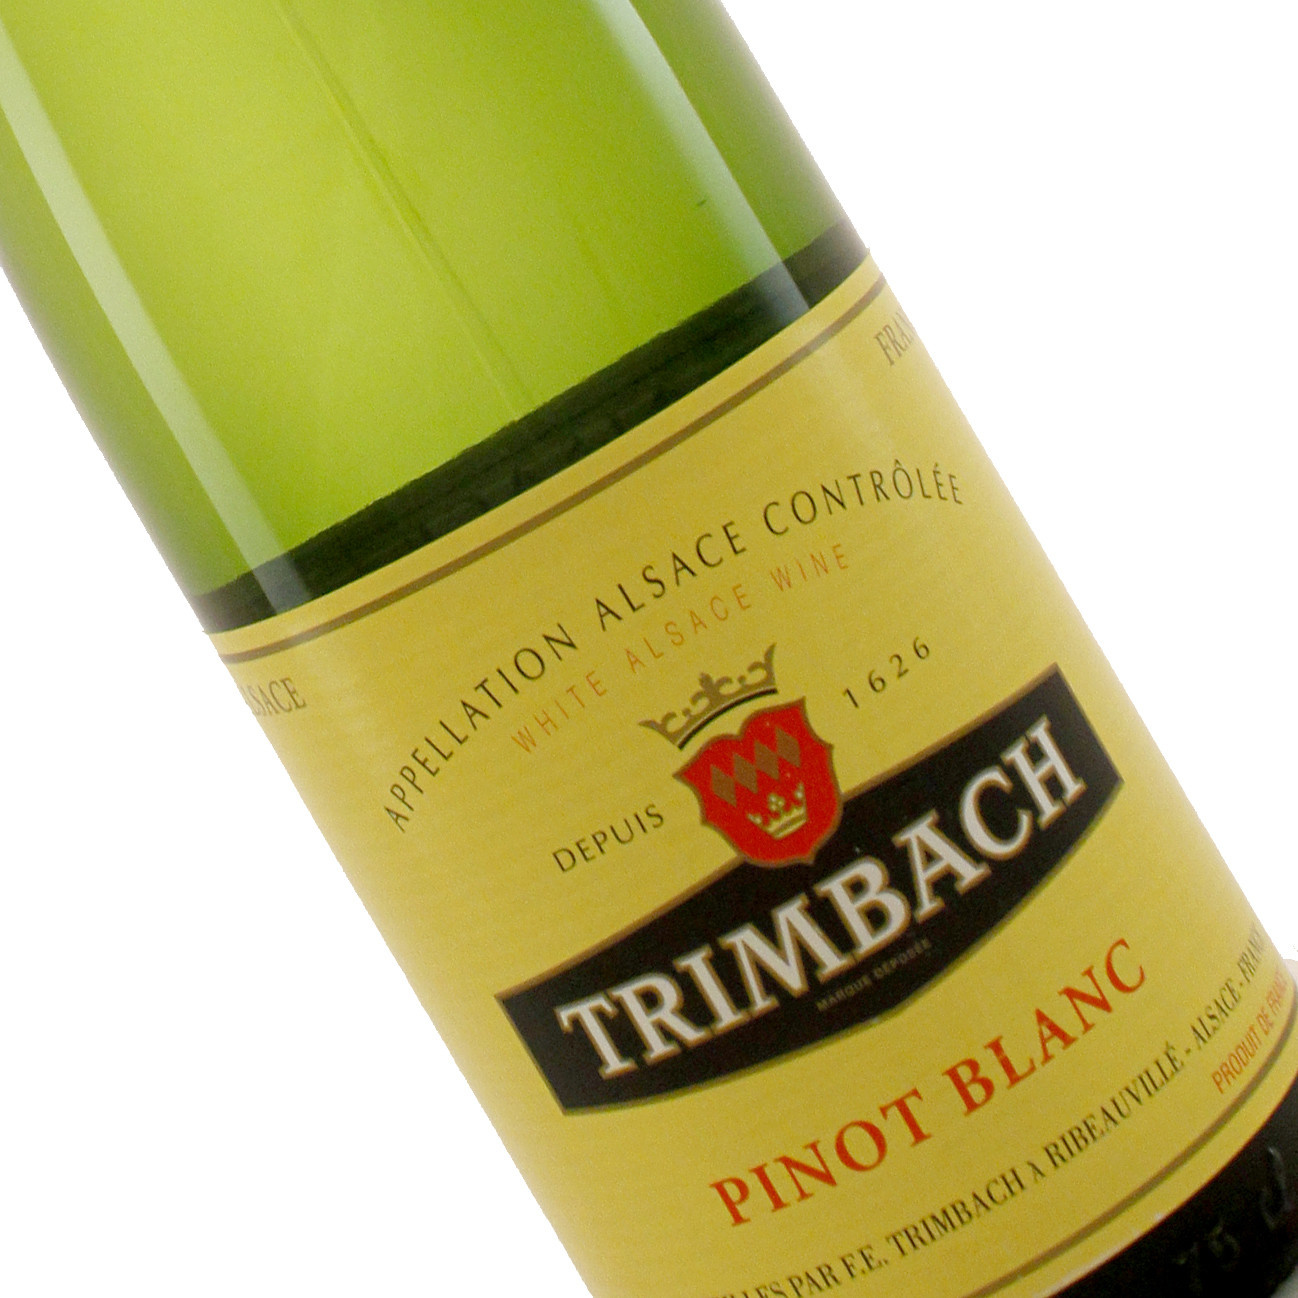 Trimbach 2016 Pinot Blanc, Alsace